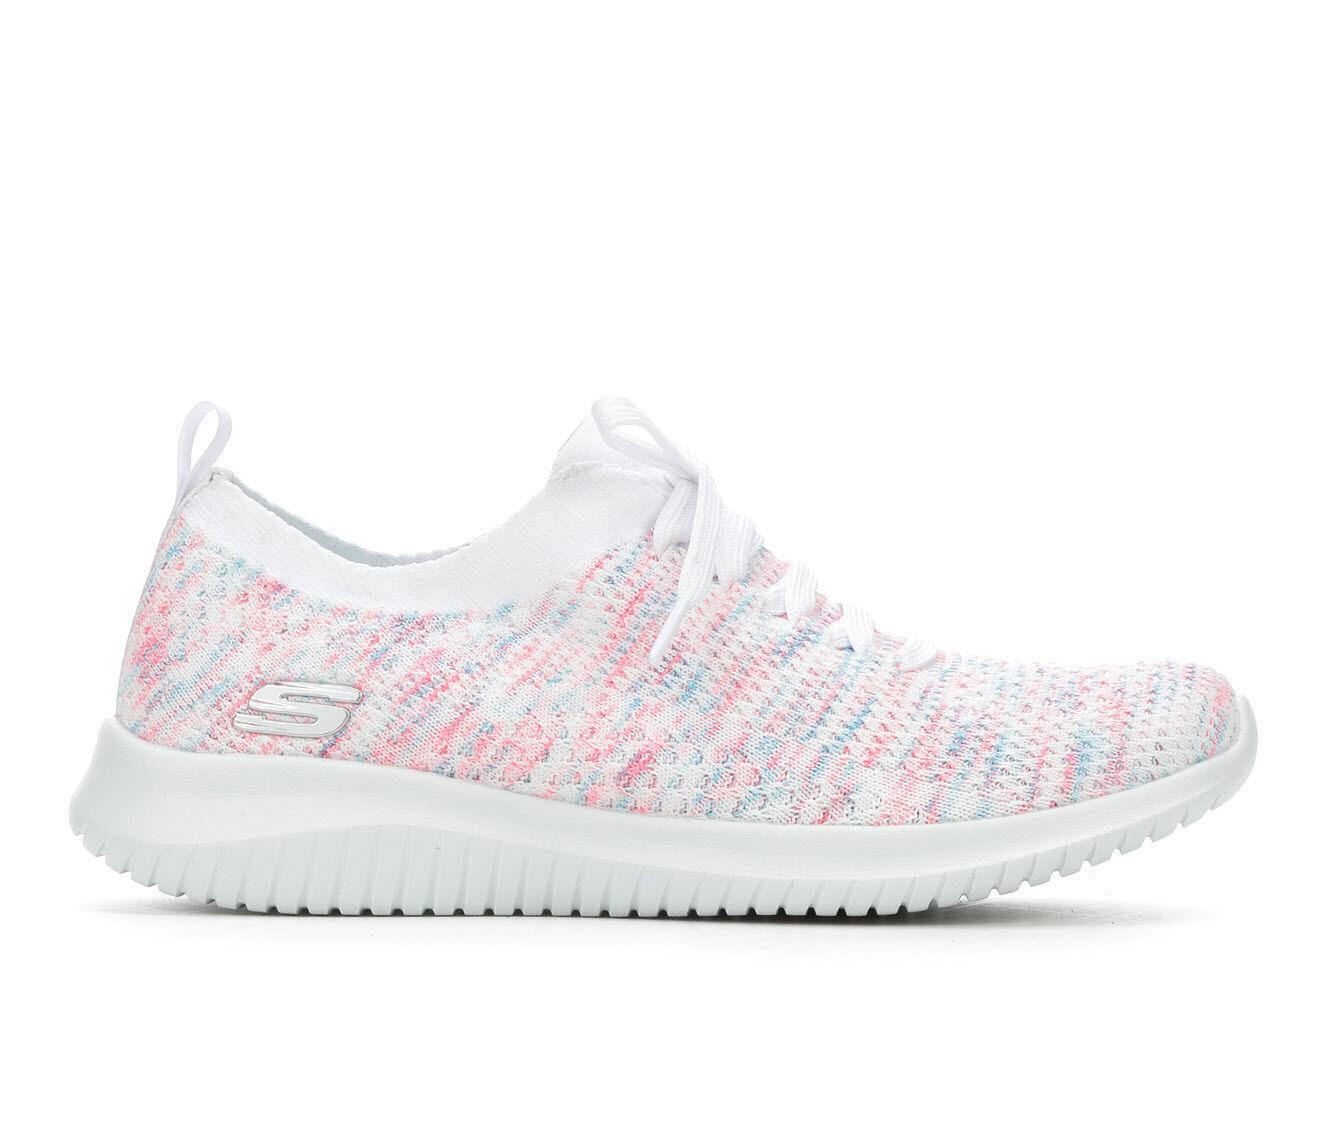 High-Fashion Women's Skechers Happy Days 13101 Slip-On Sneakers White/Pink/Blue